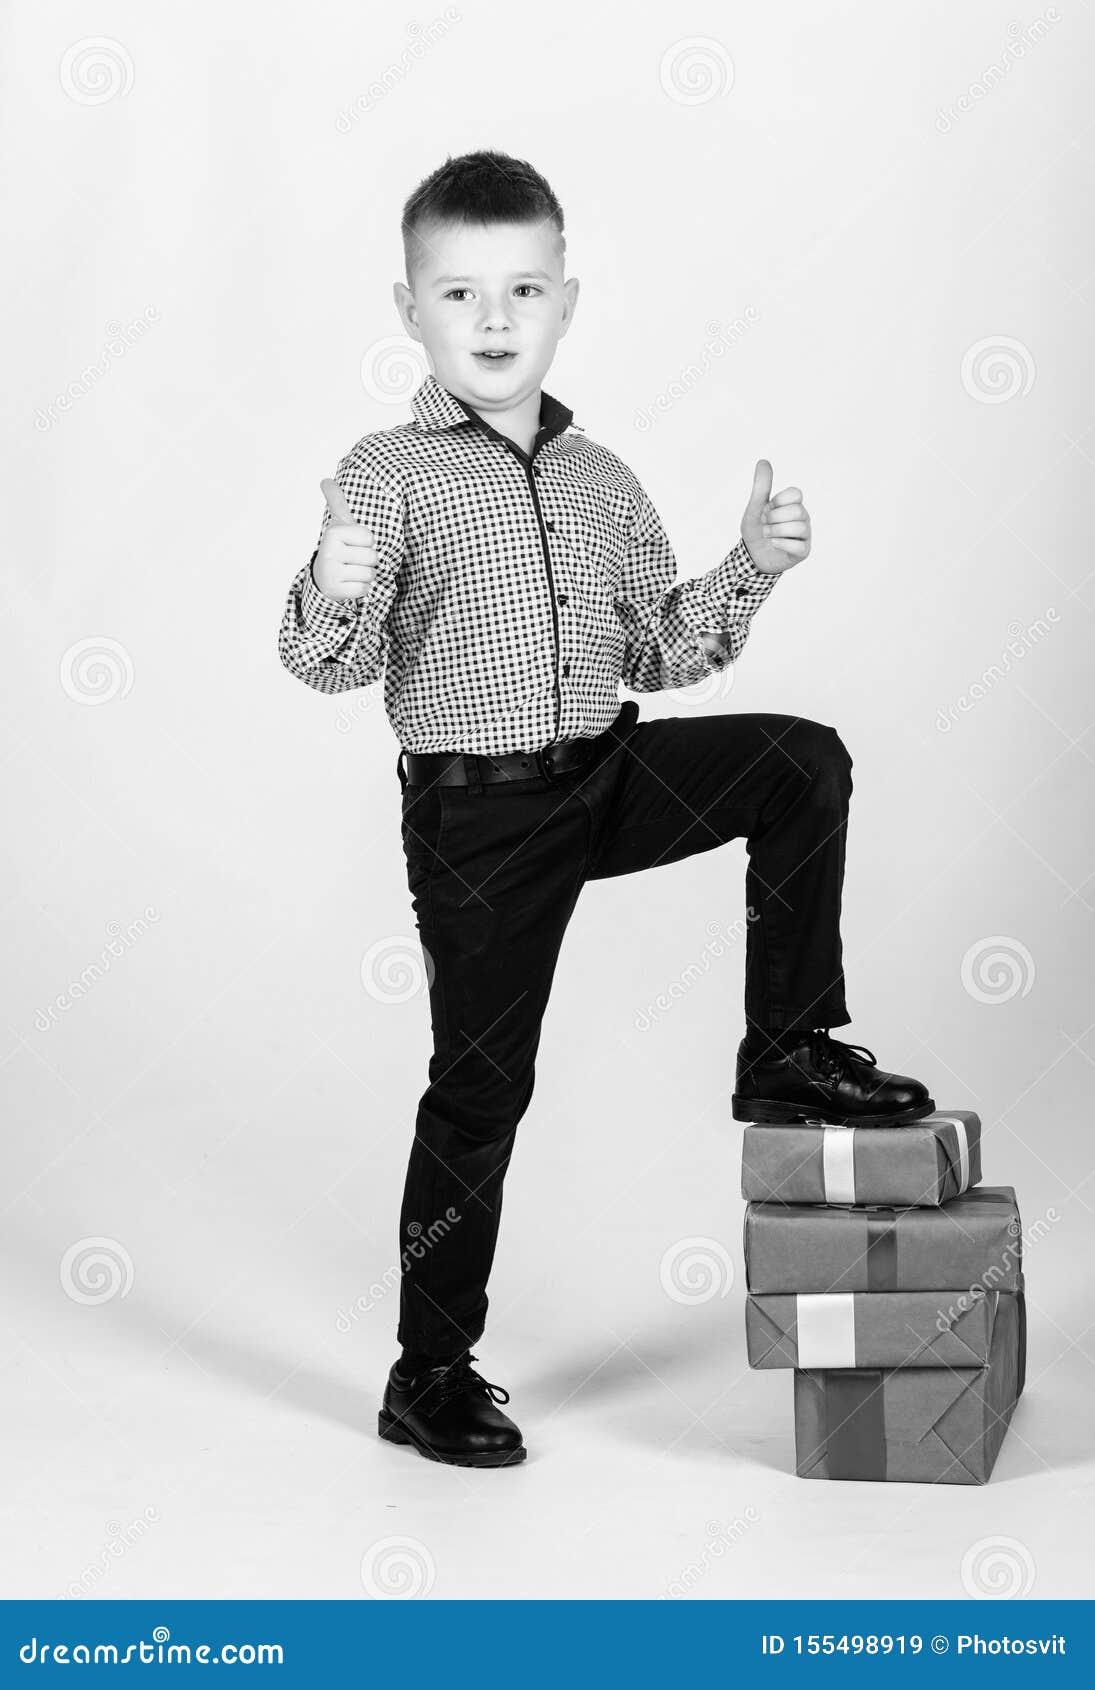 E Επόμενη μέρα των Χριστουγέννων Νέο έτος ευτυχές παιδί με το παρόν κιβώτιο : r μικρό παιδί με την ημέρα βαλεντίνων